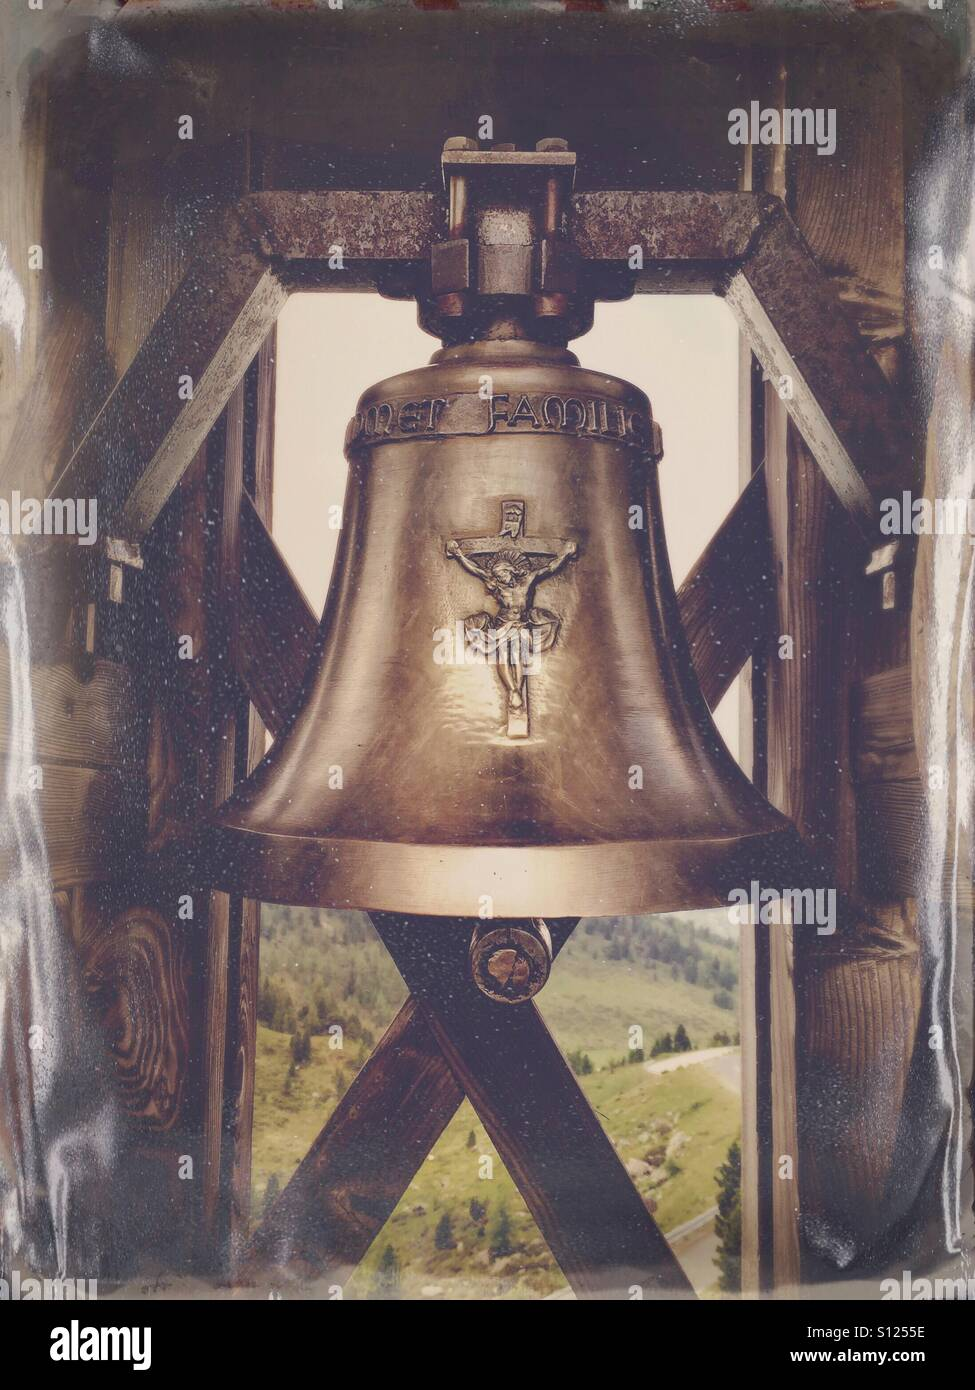 Close up of a wishing bell near Glockenhütte along the Nockalm Road (Nockalmstrasse), Austria - Stock Image